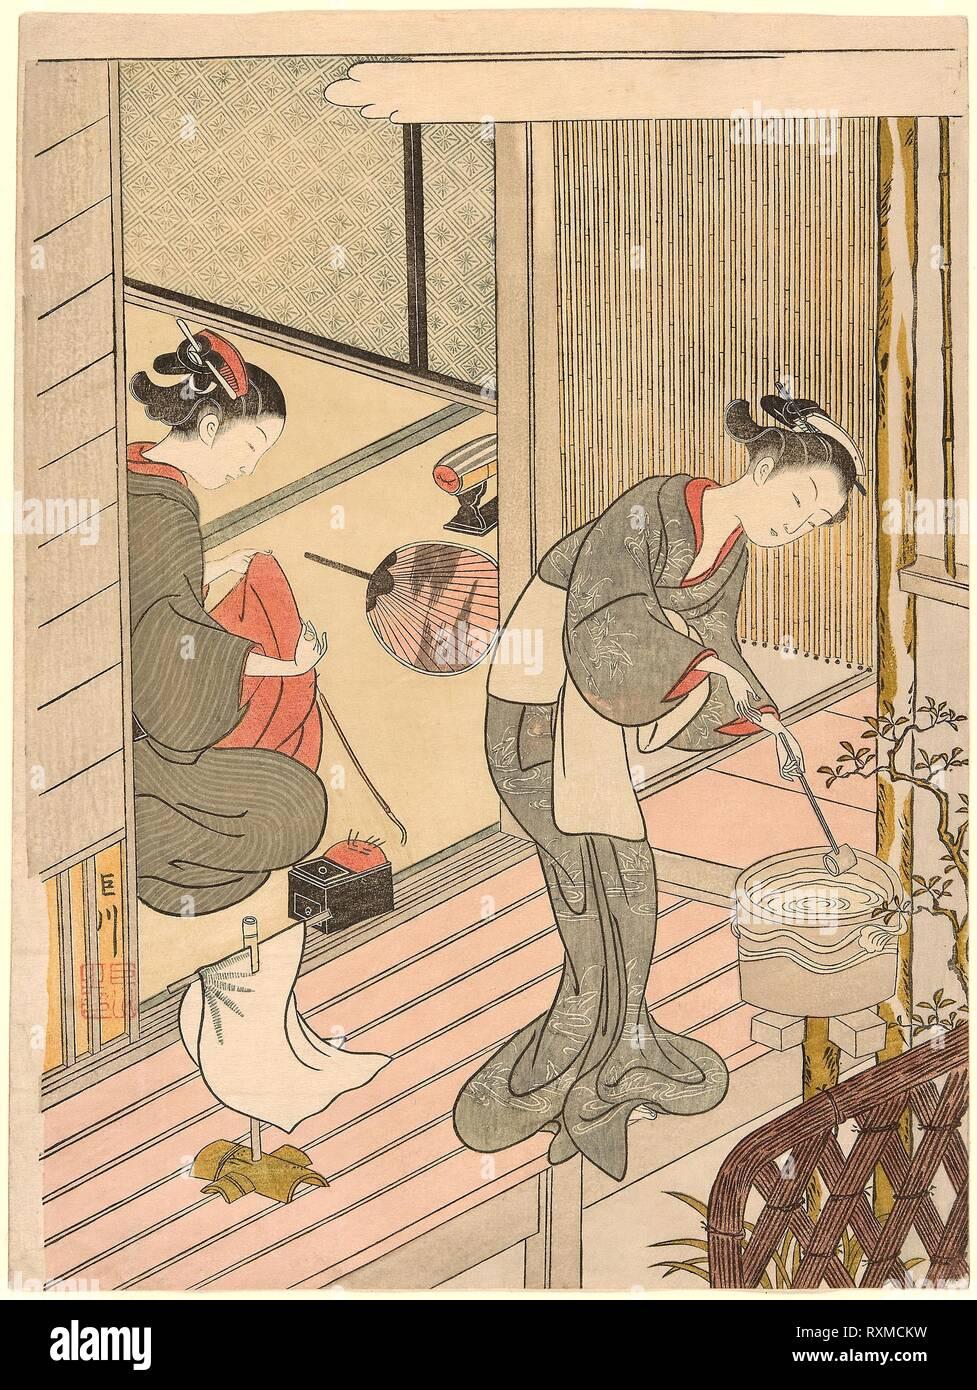 Returning Sails of the Towel Rack (Tenugui-kake no kihan), from the series 'Eight Views of the Parlor (Zashiki hakkei)'. Suzuki Harunobu ?? ??; Japanese, 1725 (?)-1770. Date: 1761-1771. Dimensions: 28.7 x 21.4 cm (11 1/4 x 8 1/2 in.). Color woodblock print; chuban, surimono. Origin: Japan. Museum: The Chicago Art Institute. - Stock Image